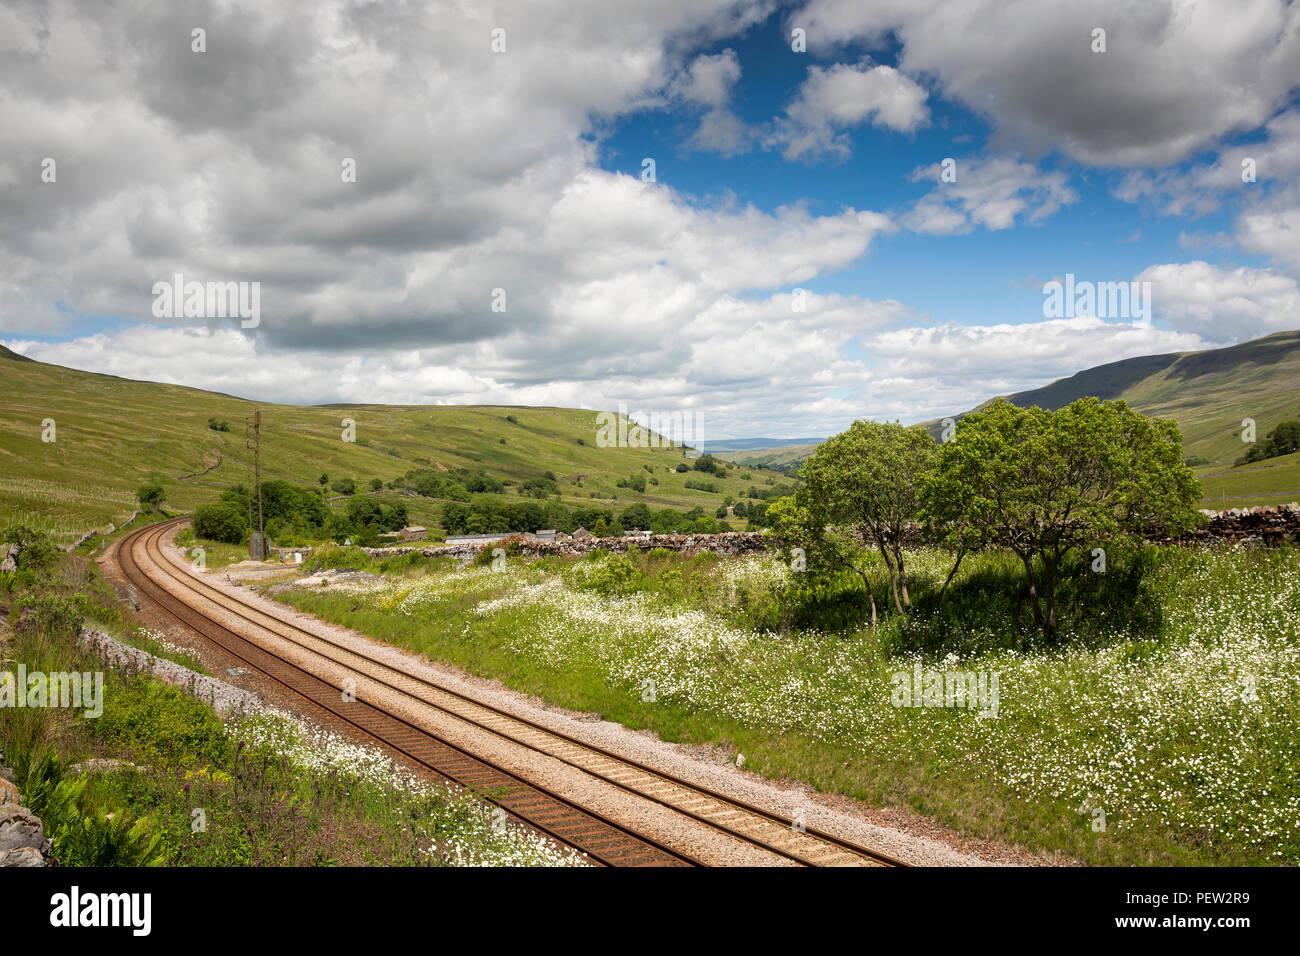 UK, Cumbria, Eden Valley, Settle to Carlisle railway line at Cotegill Bridge - Stock Image